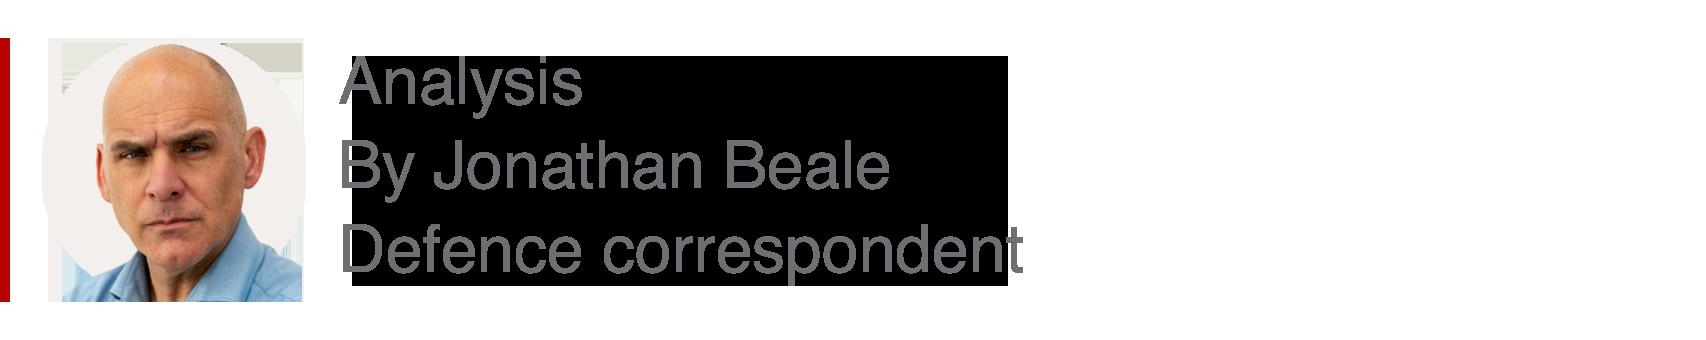 Analysis box by Jonathan Beale, defence correspondent